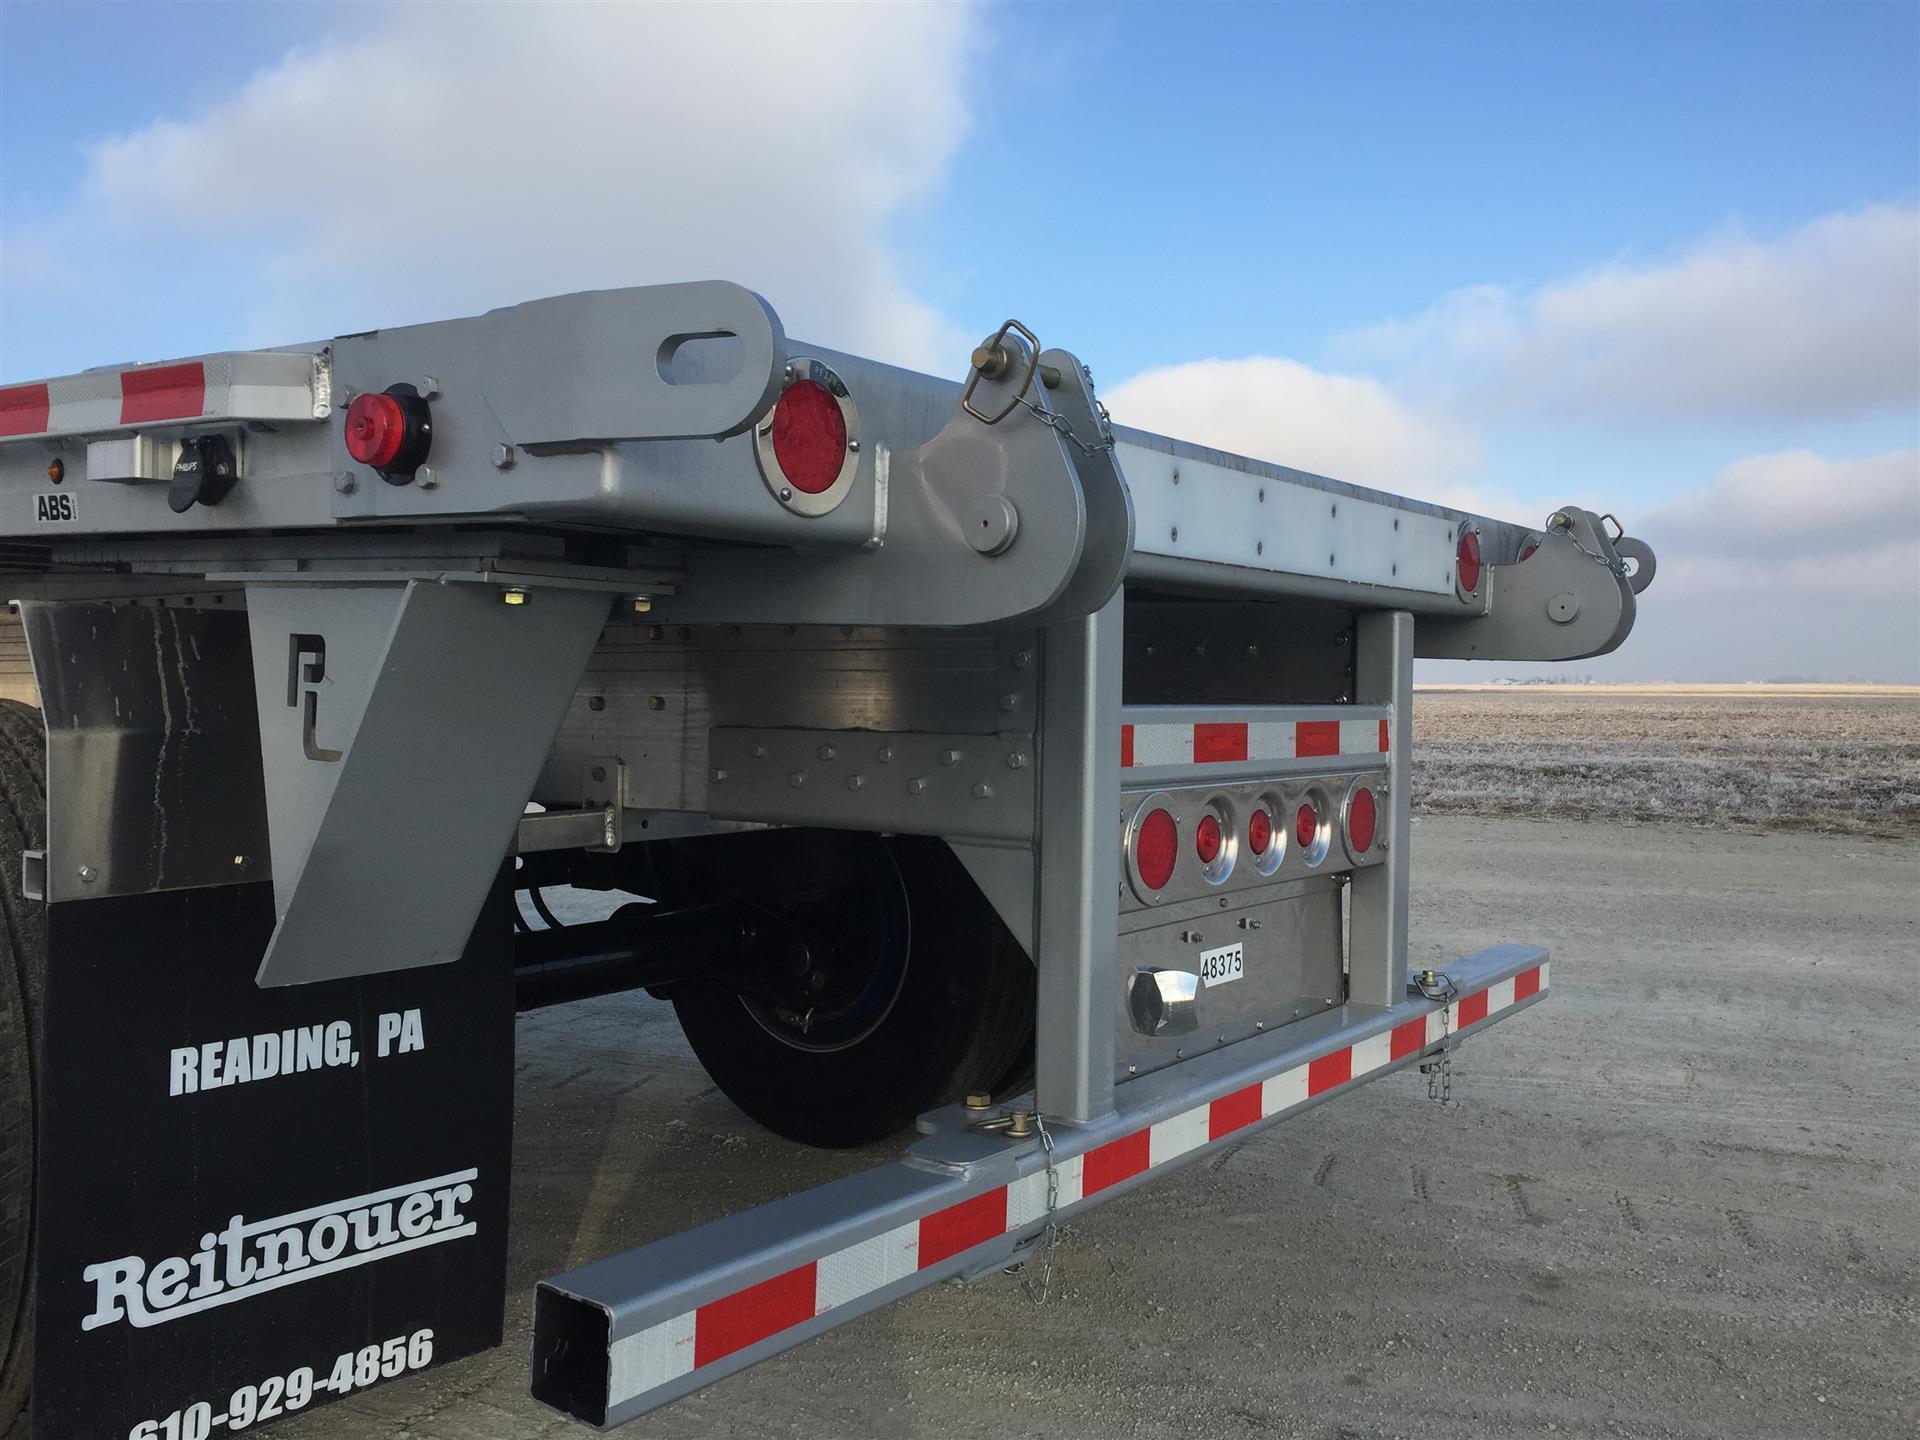 2019 Reitnouer Maxmiser w/Prowler Forklift Mo